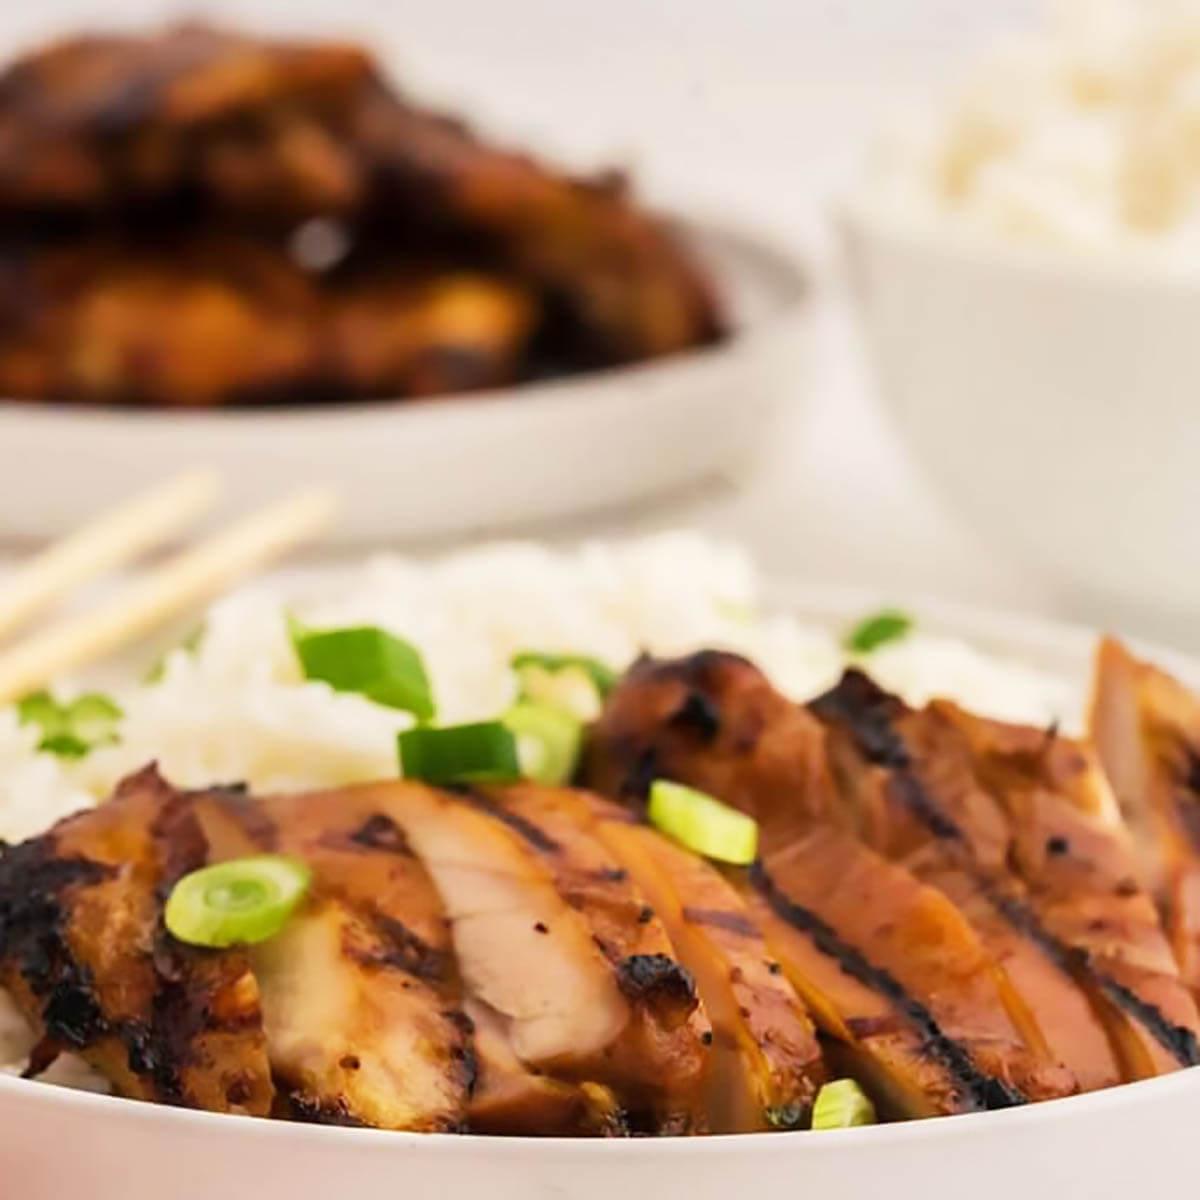 Sliced teriyaki chicken served with rice.